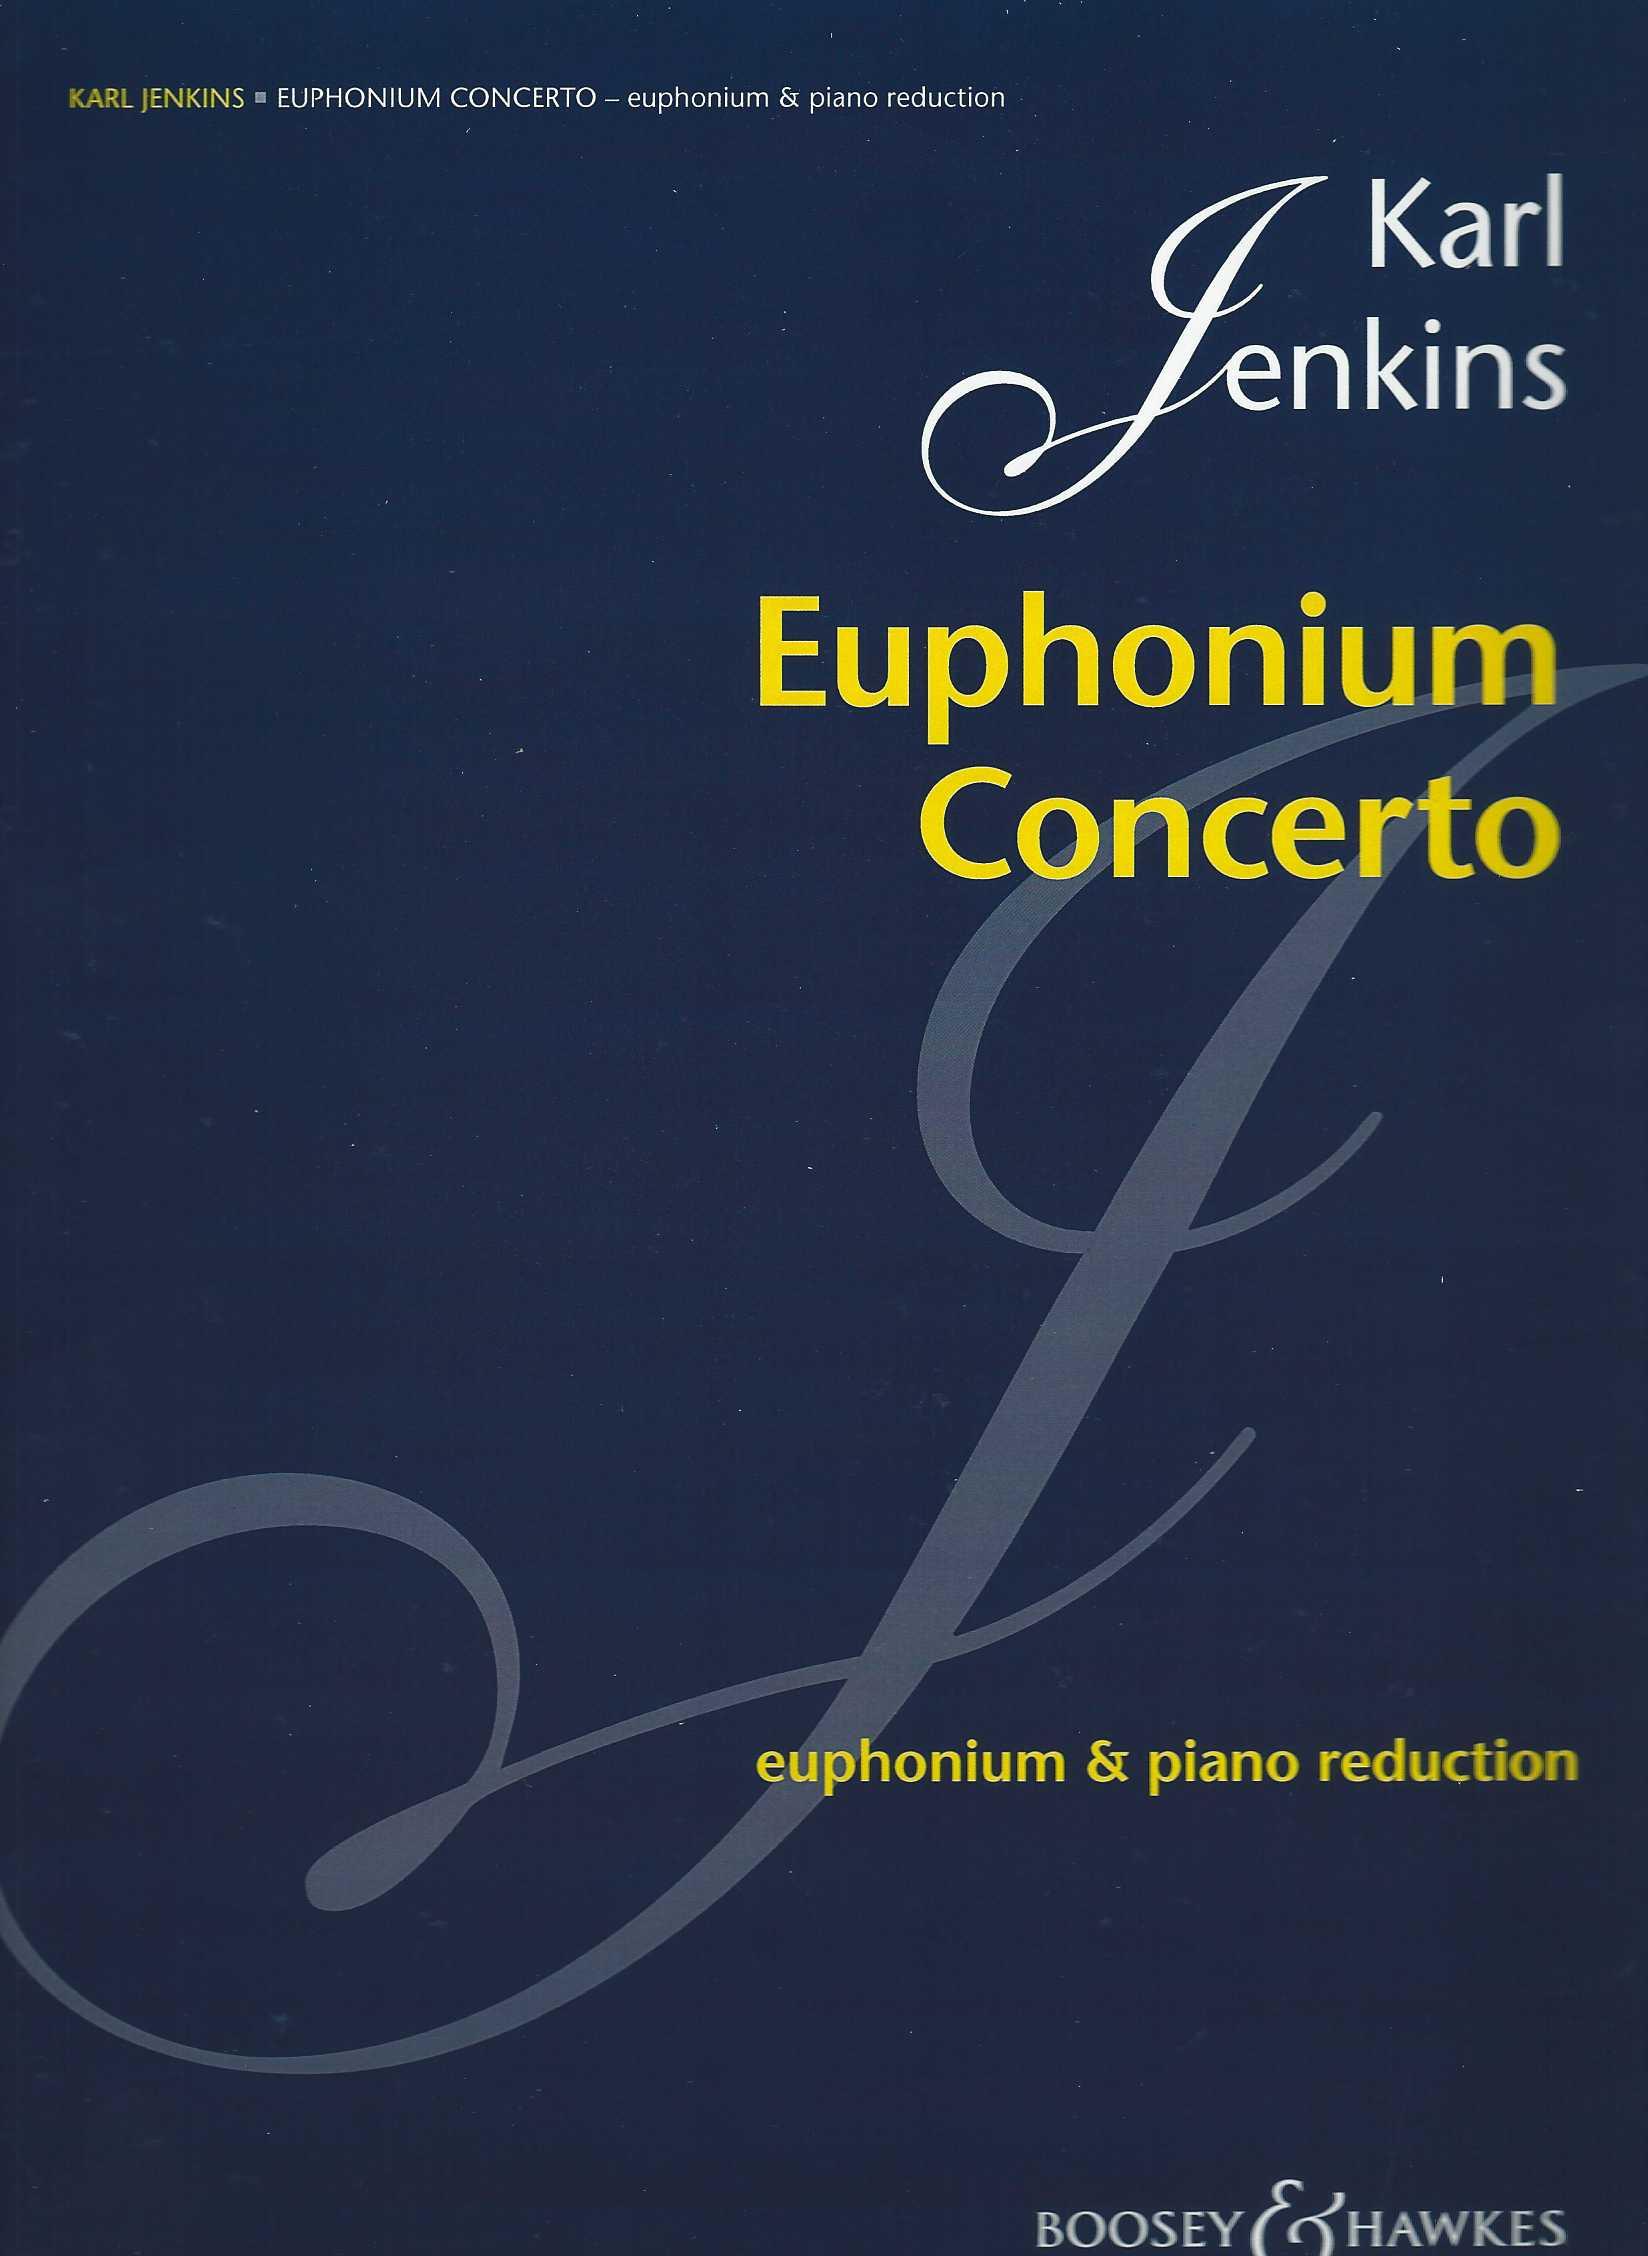 Euphonium Concerto - Karl Jenkins - Euphonium and Piano version